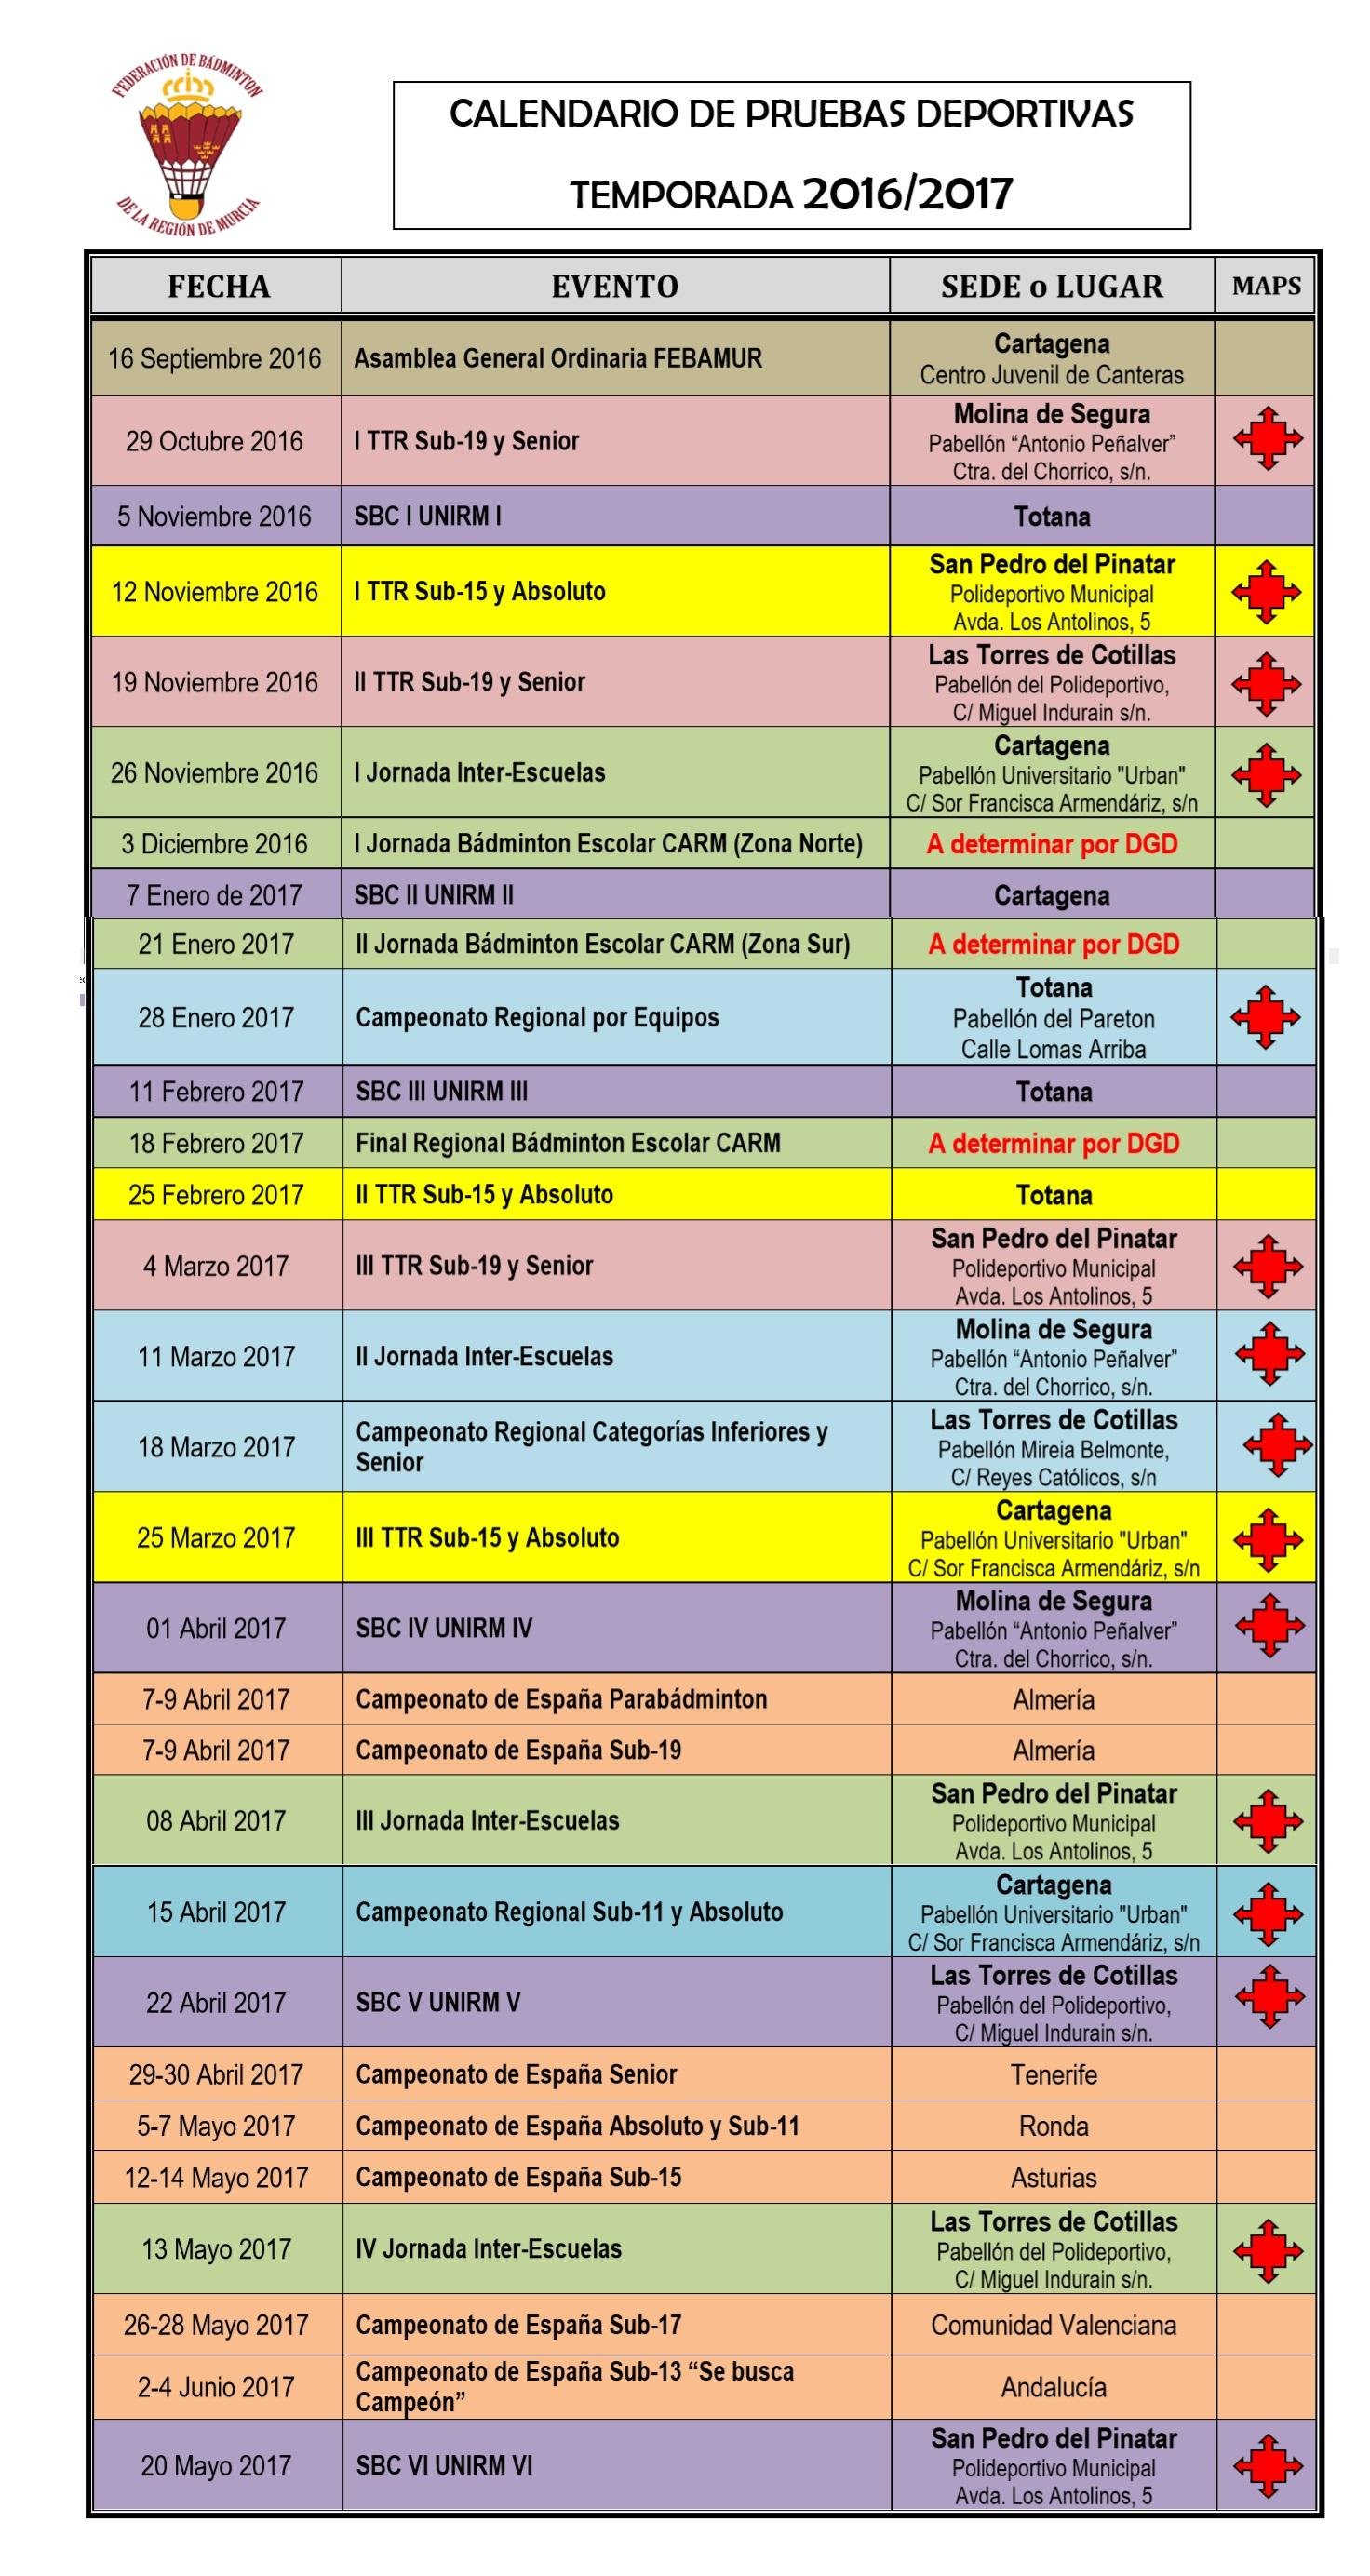 Calendario Deportivo Temporada 201617